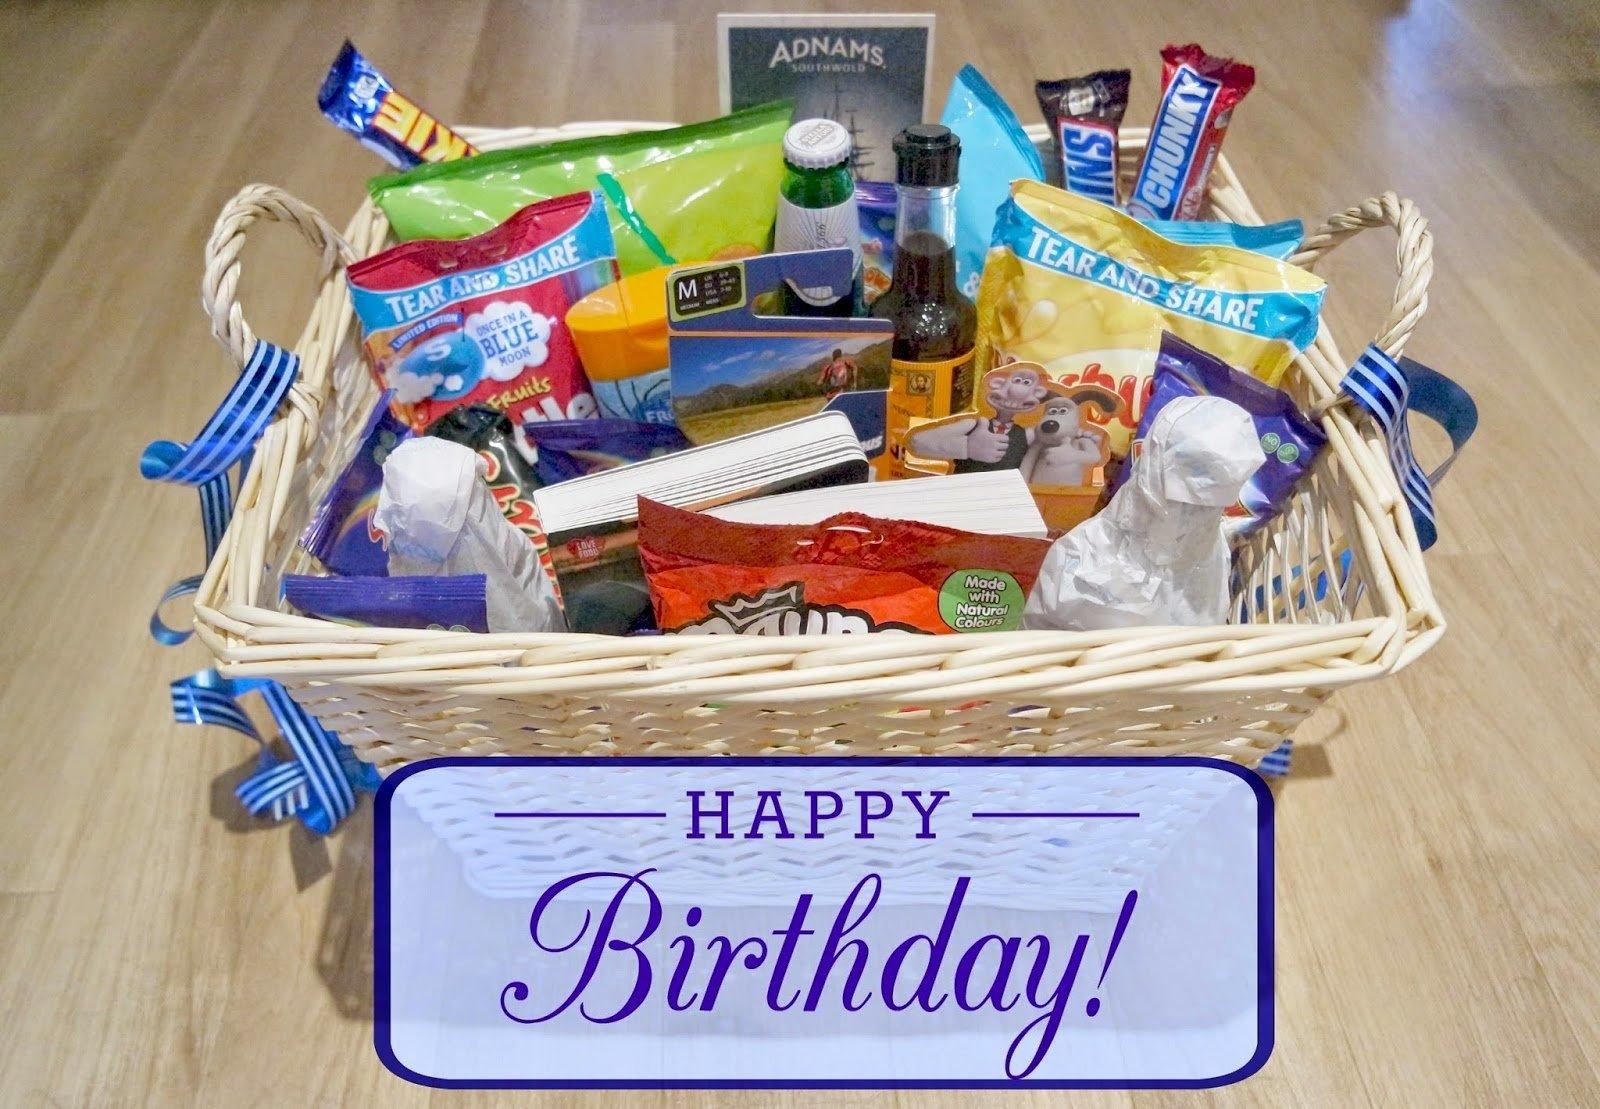 10 Attractive 50 Birthday Gift Ideas For Men Uptown Peach My Dads 50th Hamper Mens